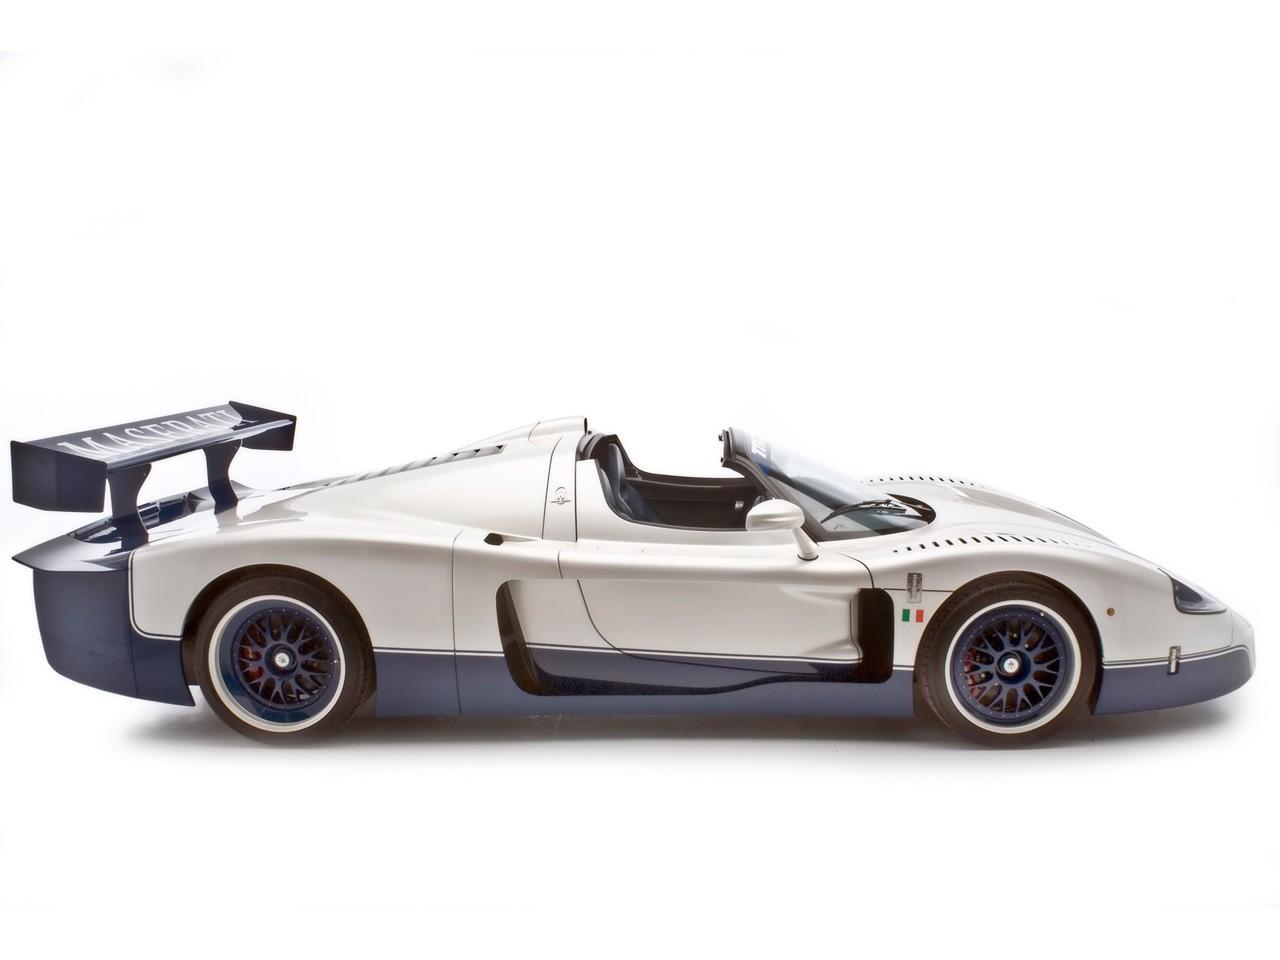 2008 Edo Competition Maserati MC12